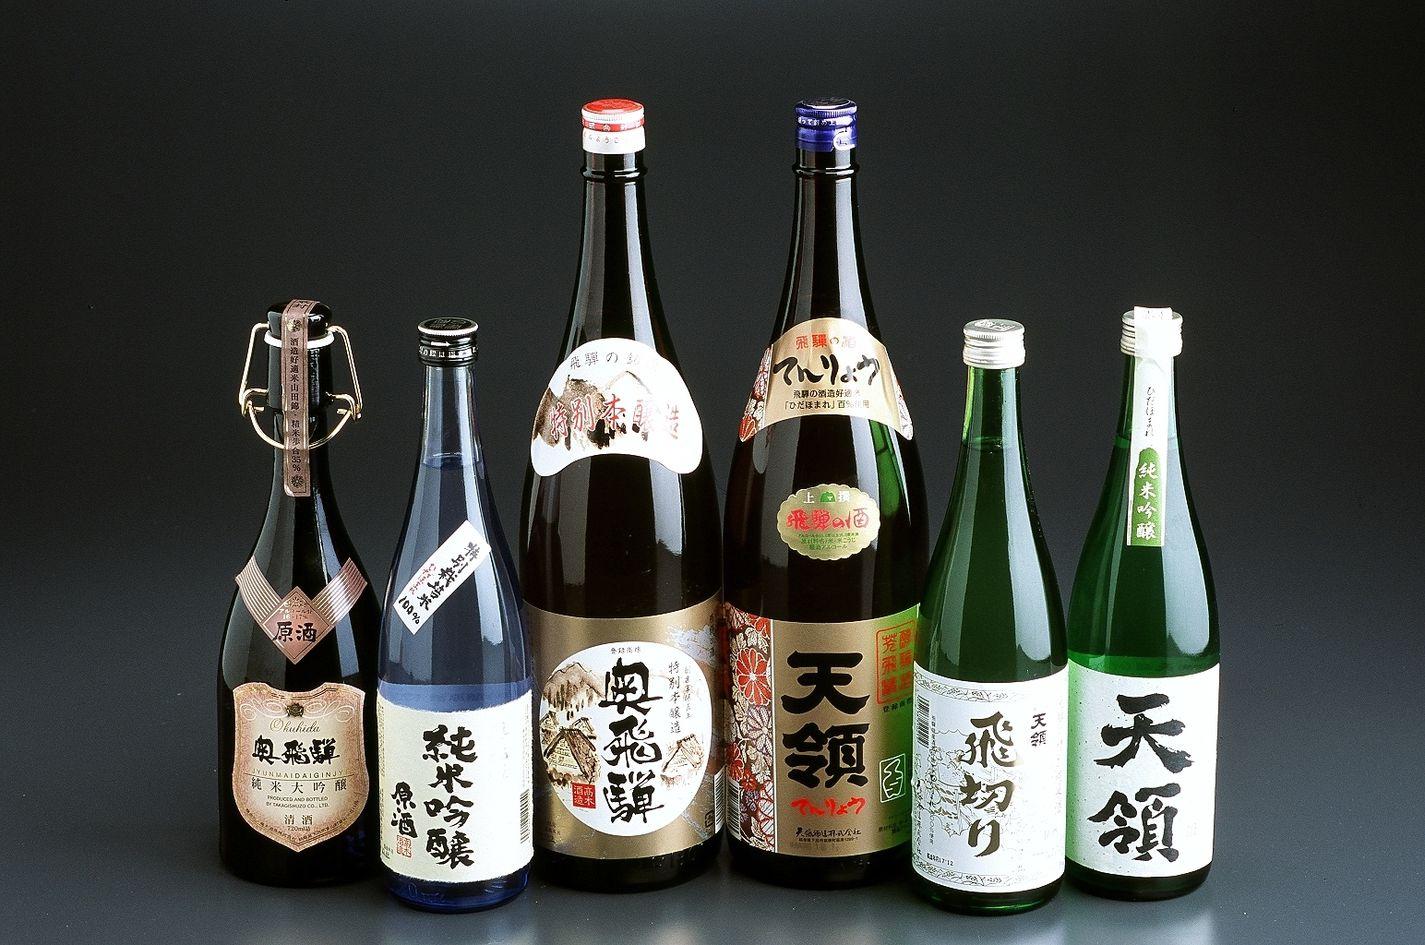 Gero_JapaneseSAKE